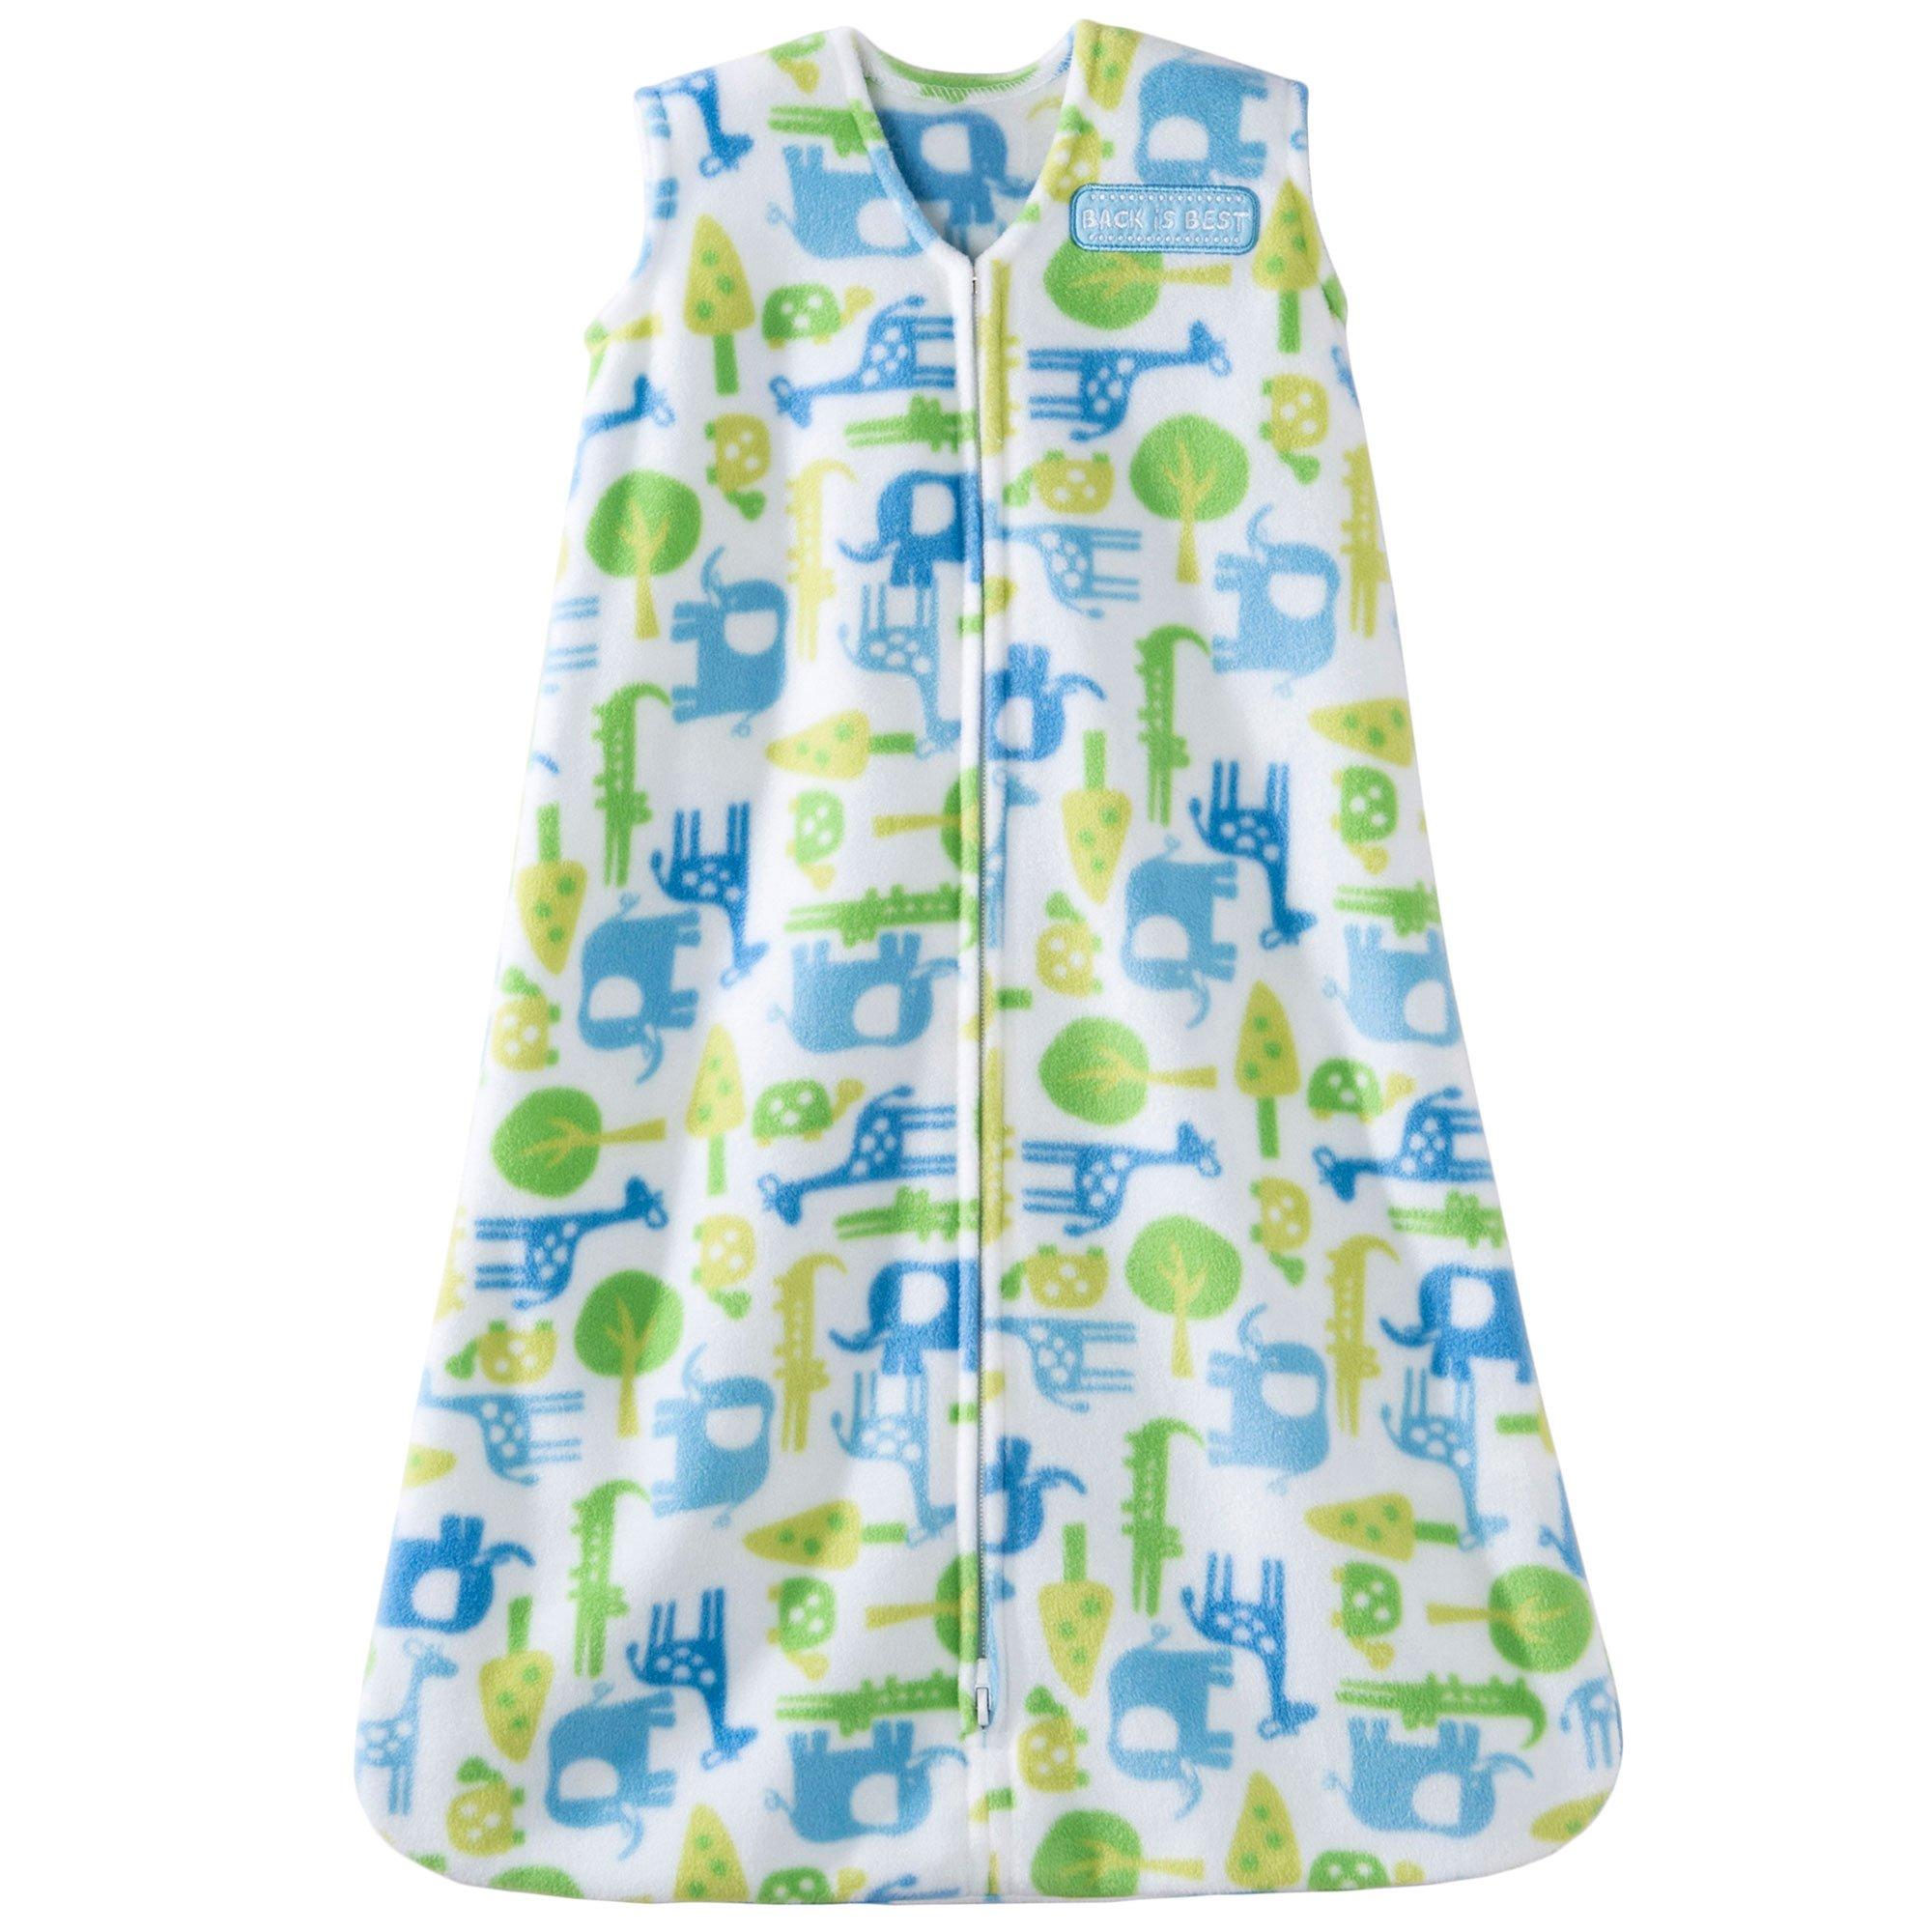 Halo SleepSack Micro-Fleece Wearable Blanket, Blue Jungle, Medium